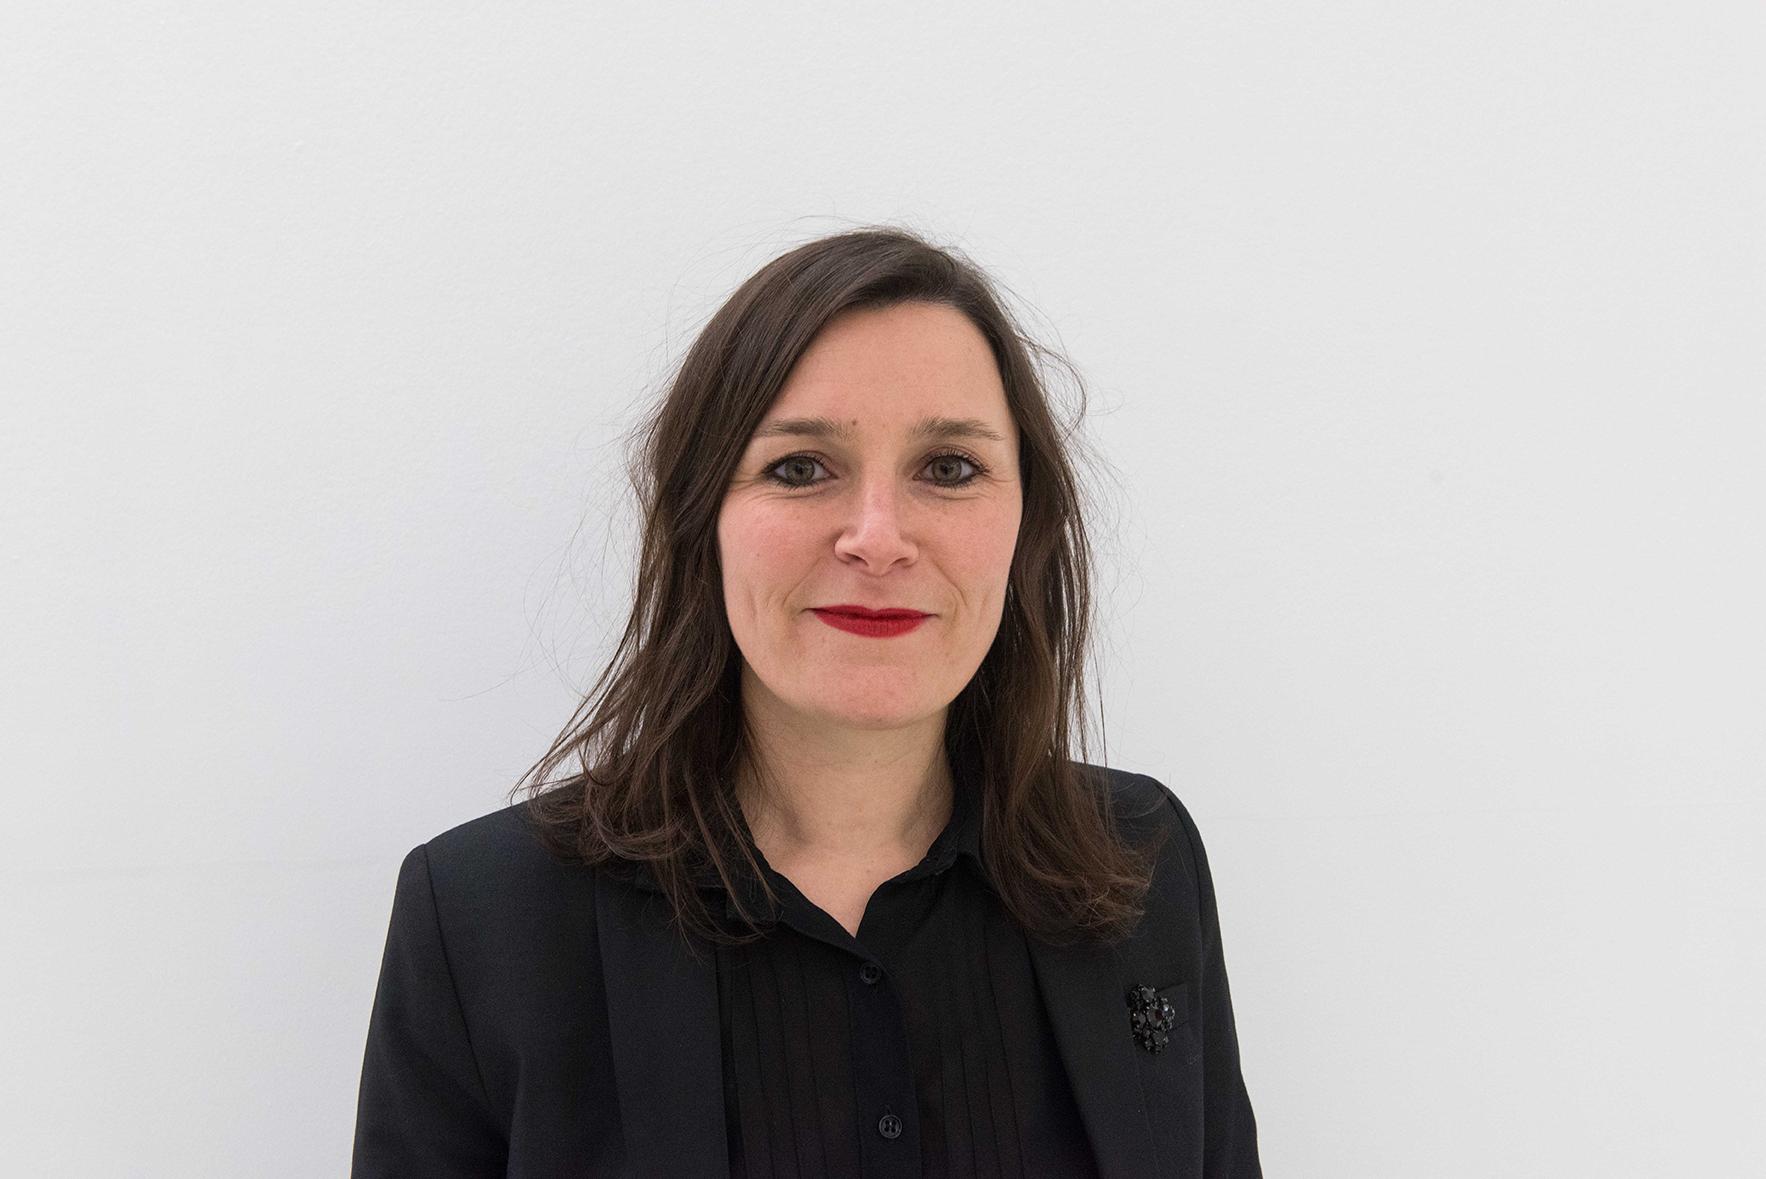 © Hélène Mauri, 2017